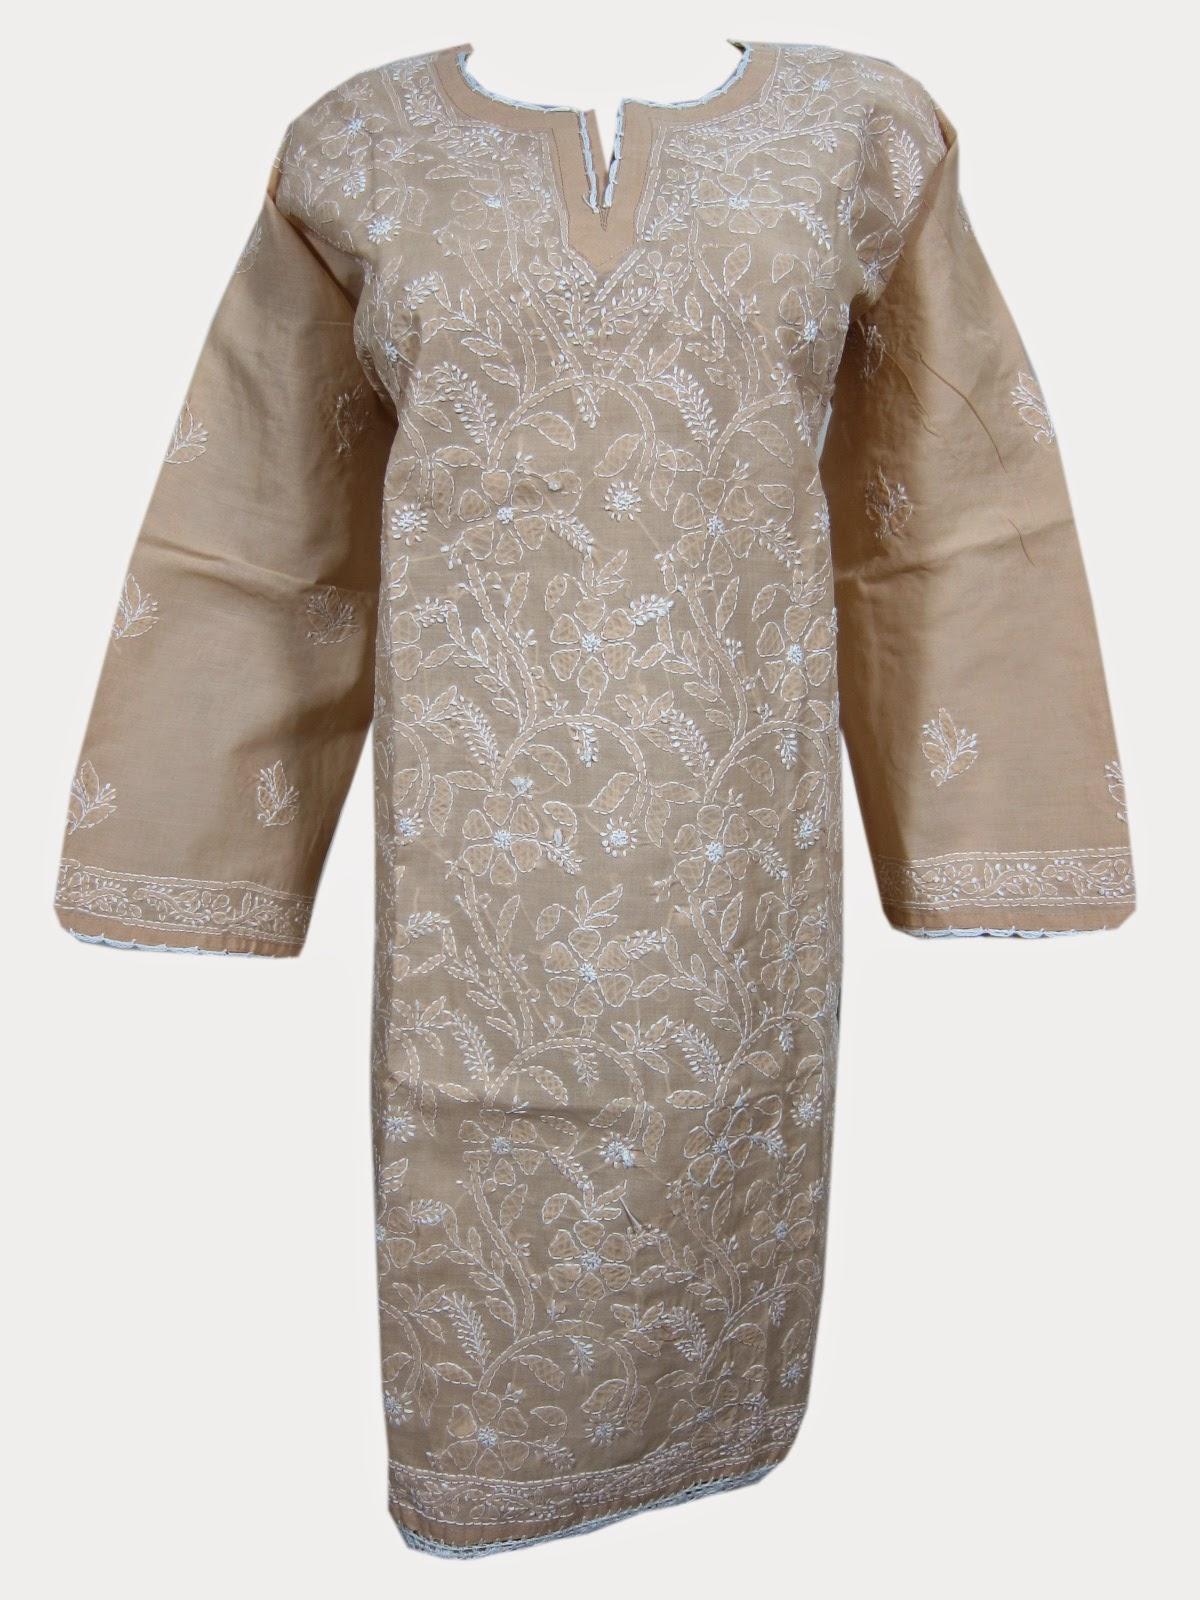 Mogul interior designs indian tunics dresses kurta for Mogul interior designs